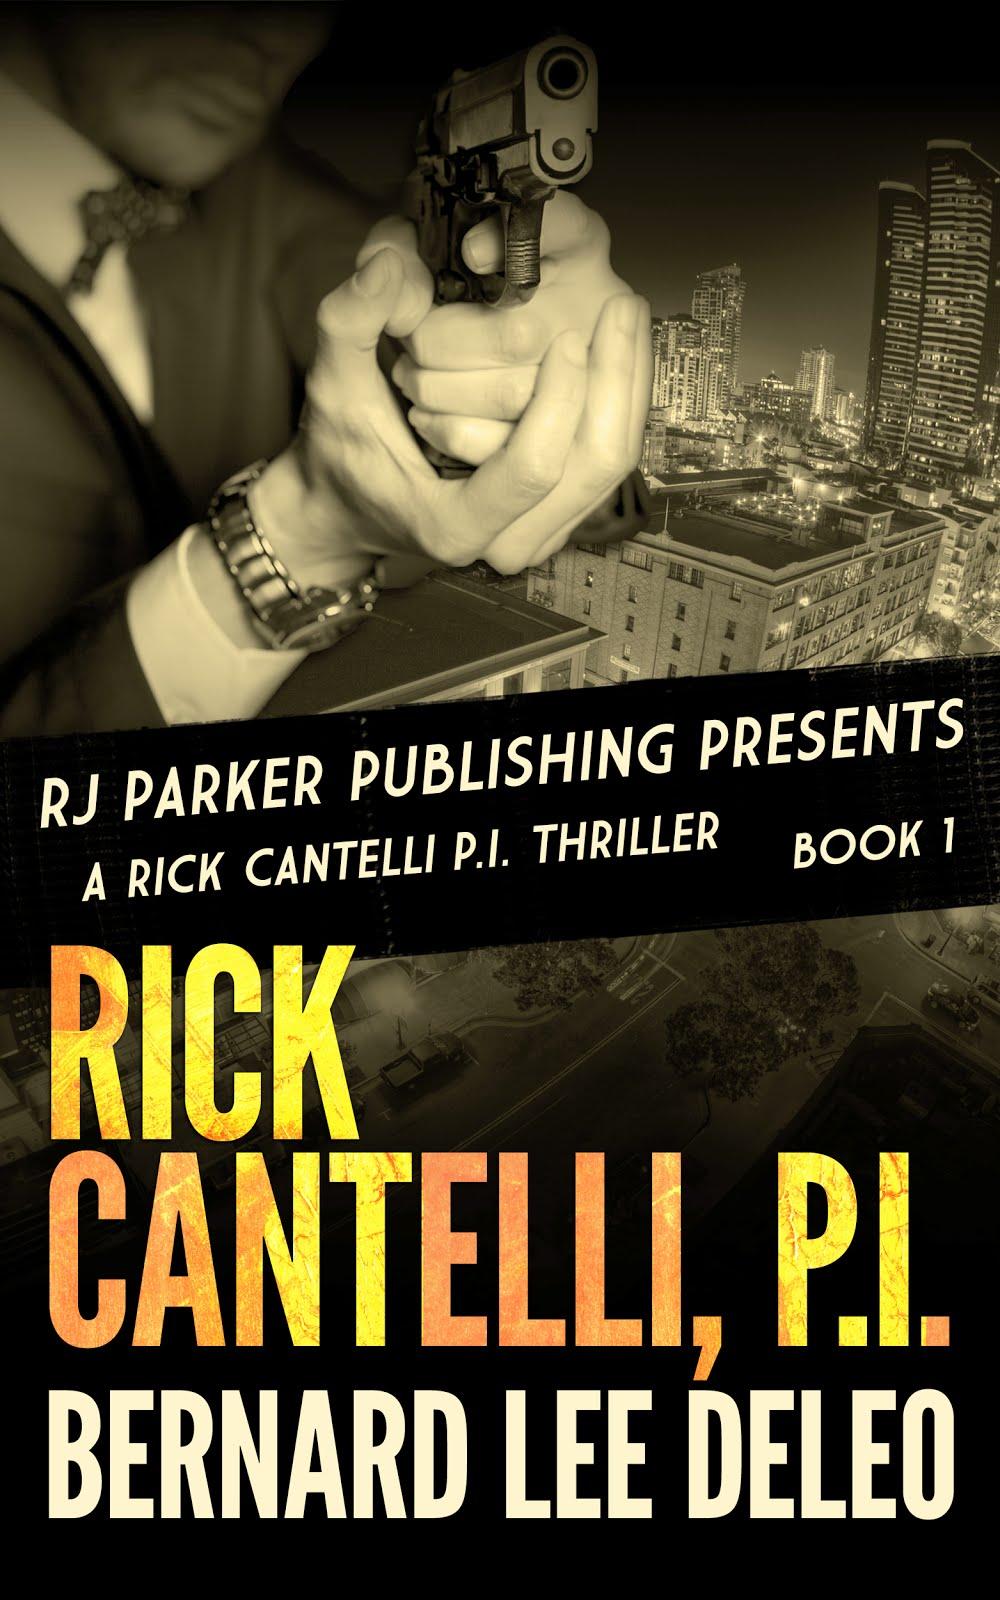 Rick Cantelli, P.I.